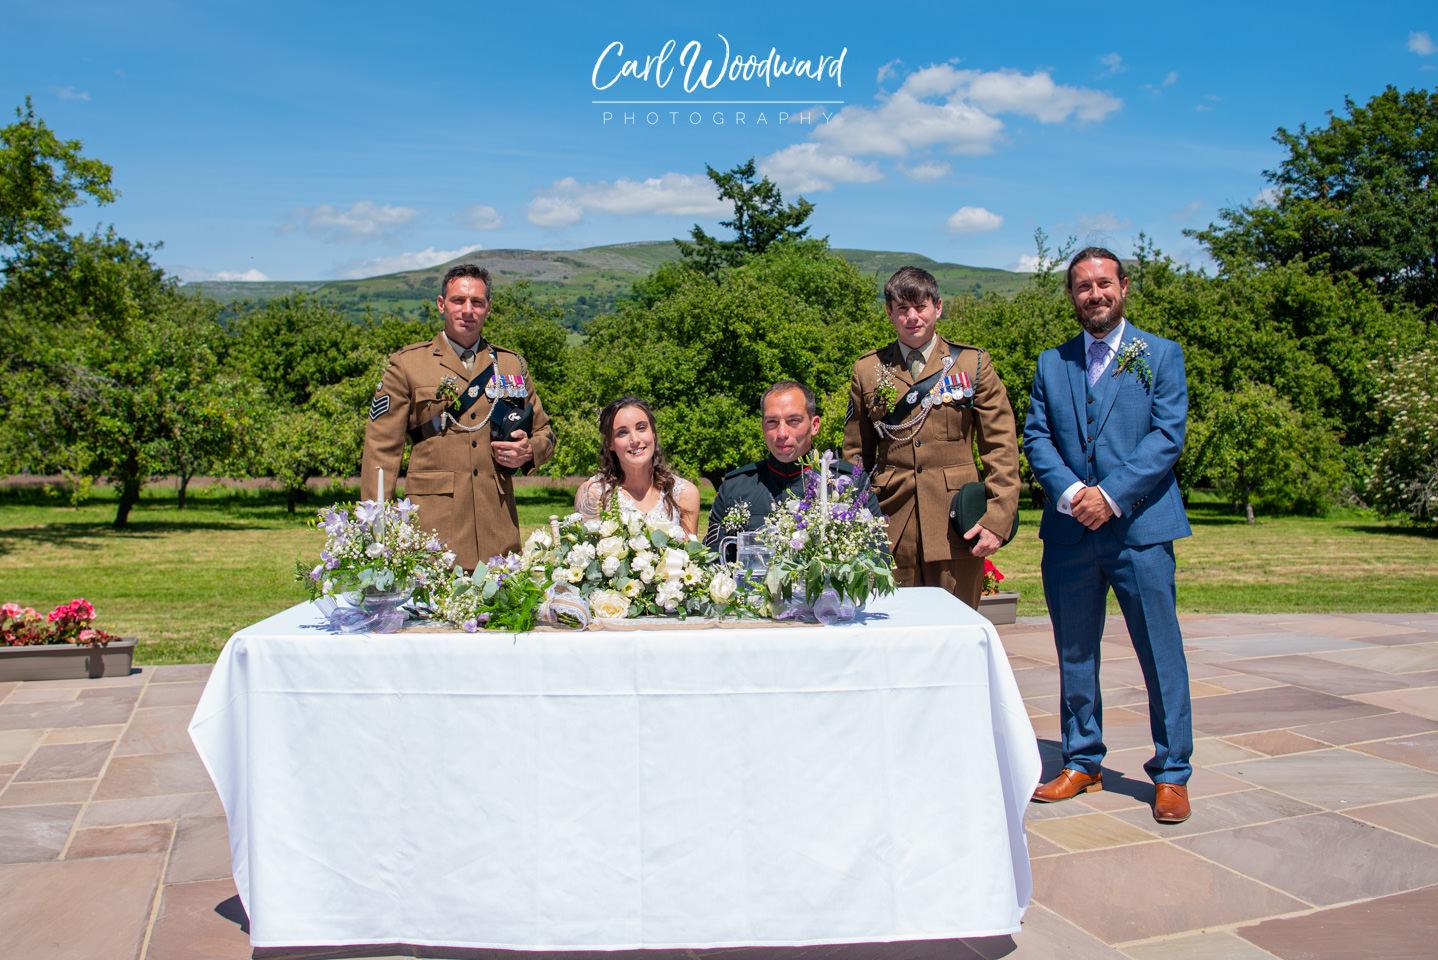 008-The-Old-Rectory-Hotel-Wedding-Photography-Cardiff-Wedding-Photographer.jpg